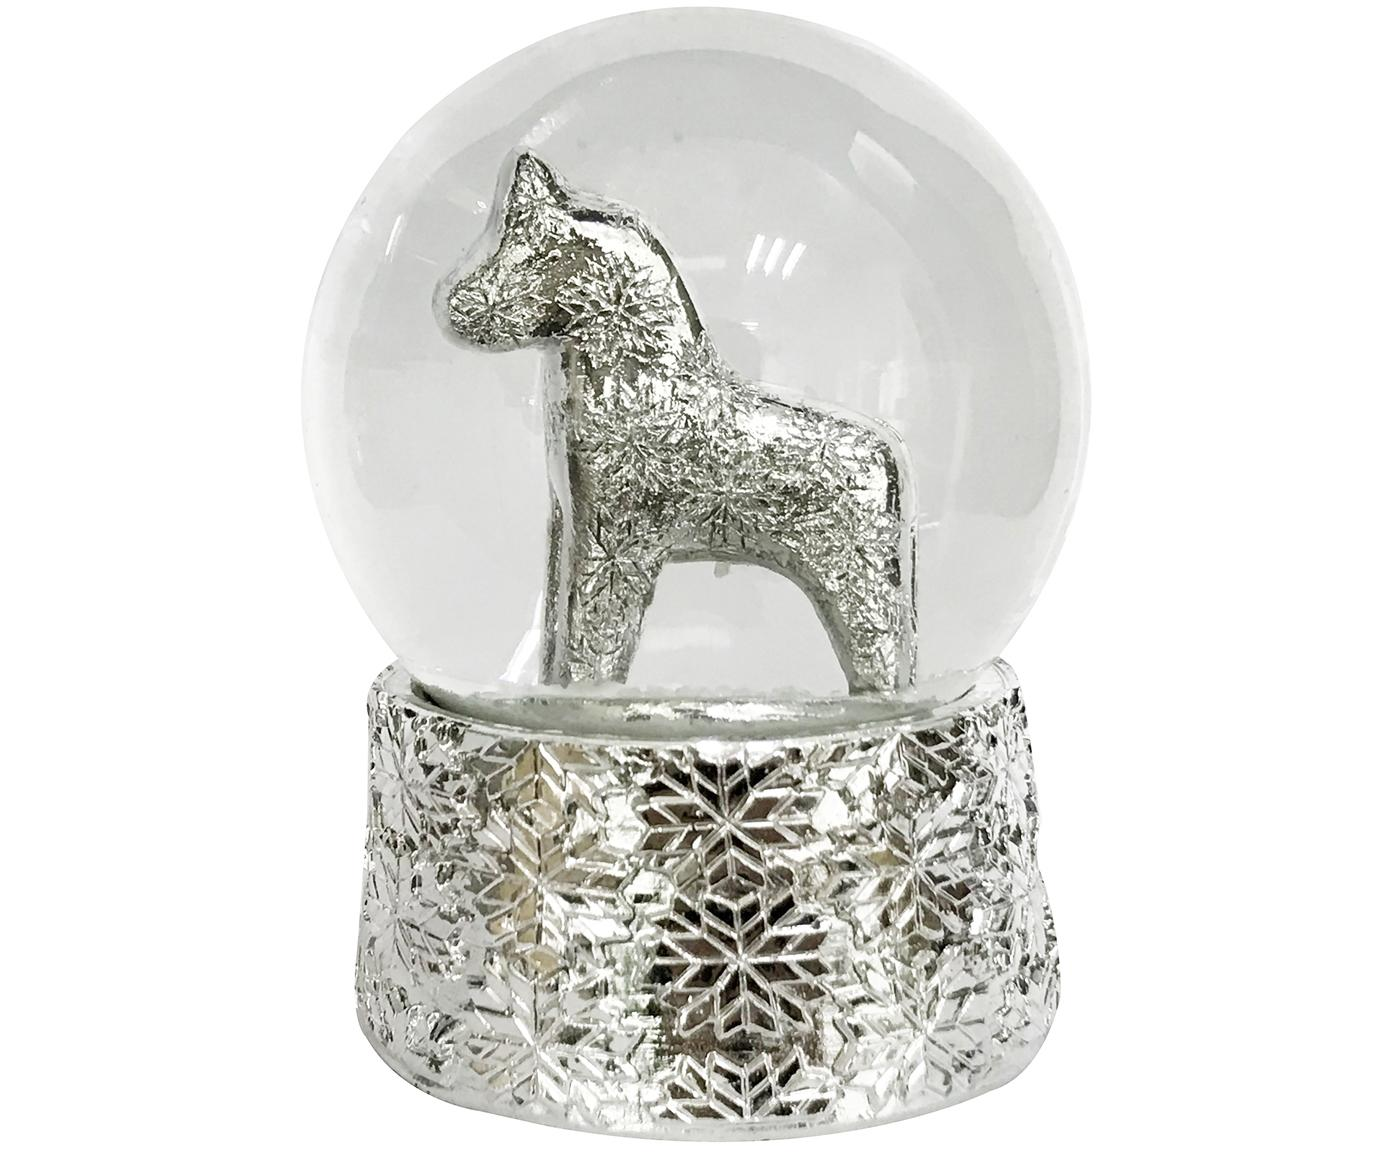 Schneekugel Serafina Horse, Sockel: Polyresin, Silberfarben, Ø 7 x H 8 cm